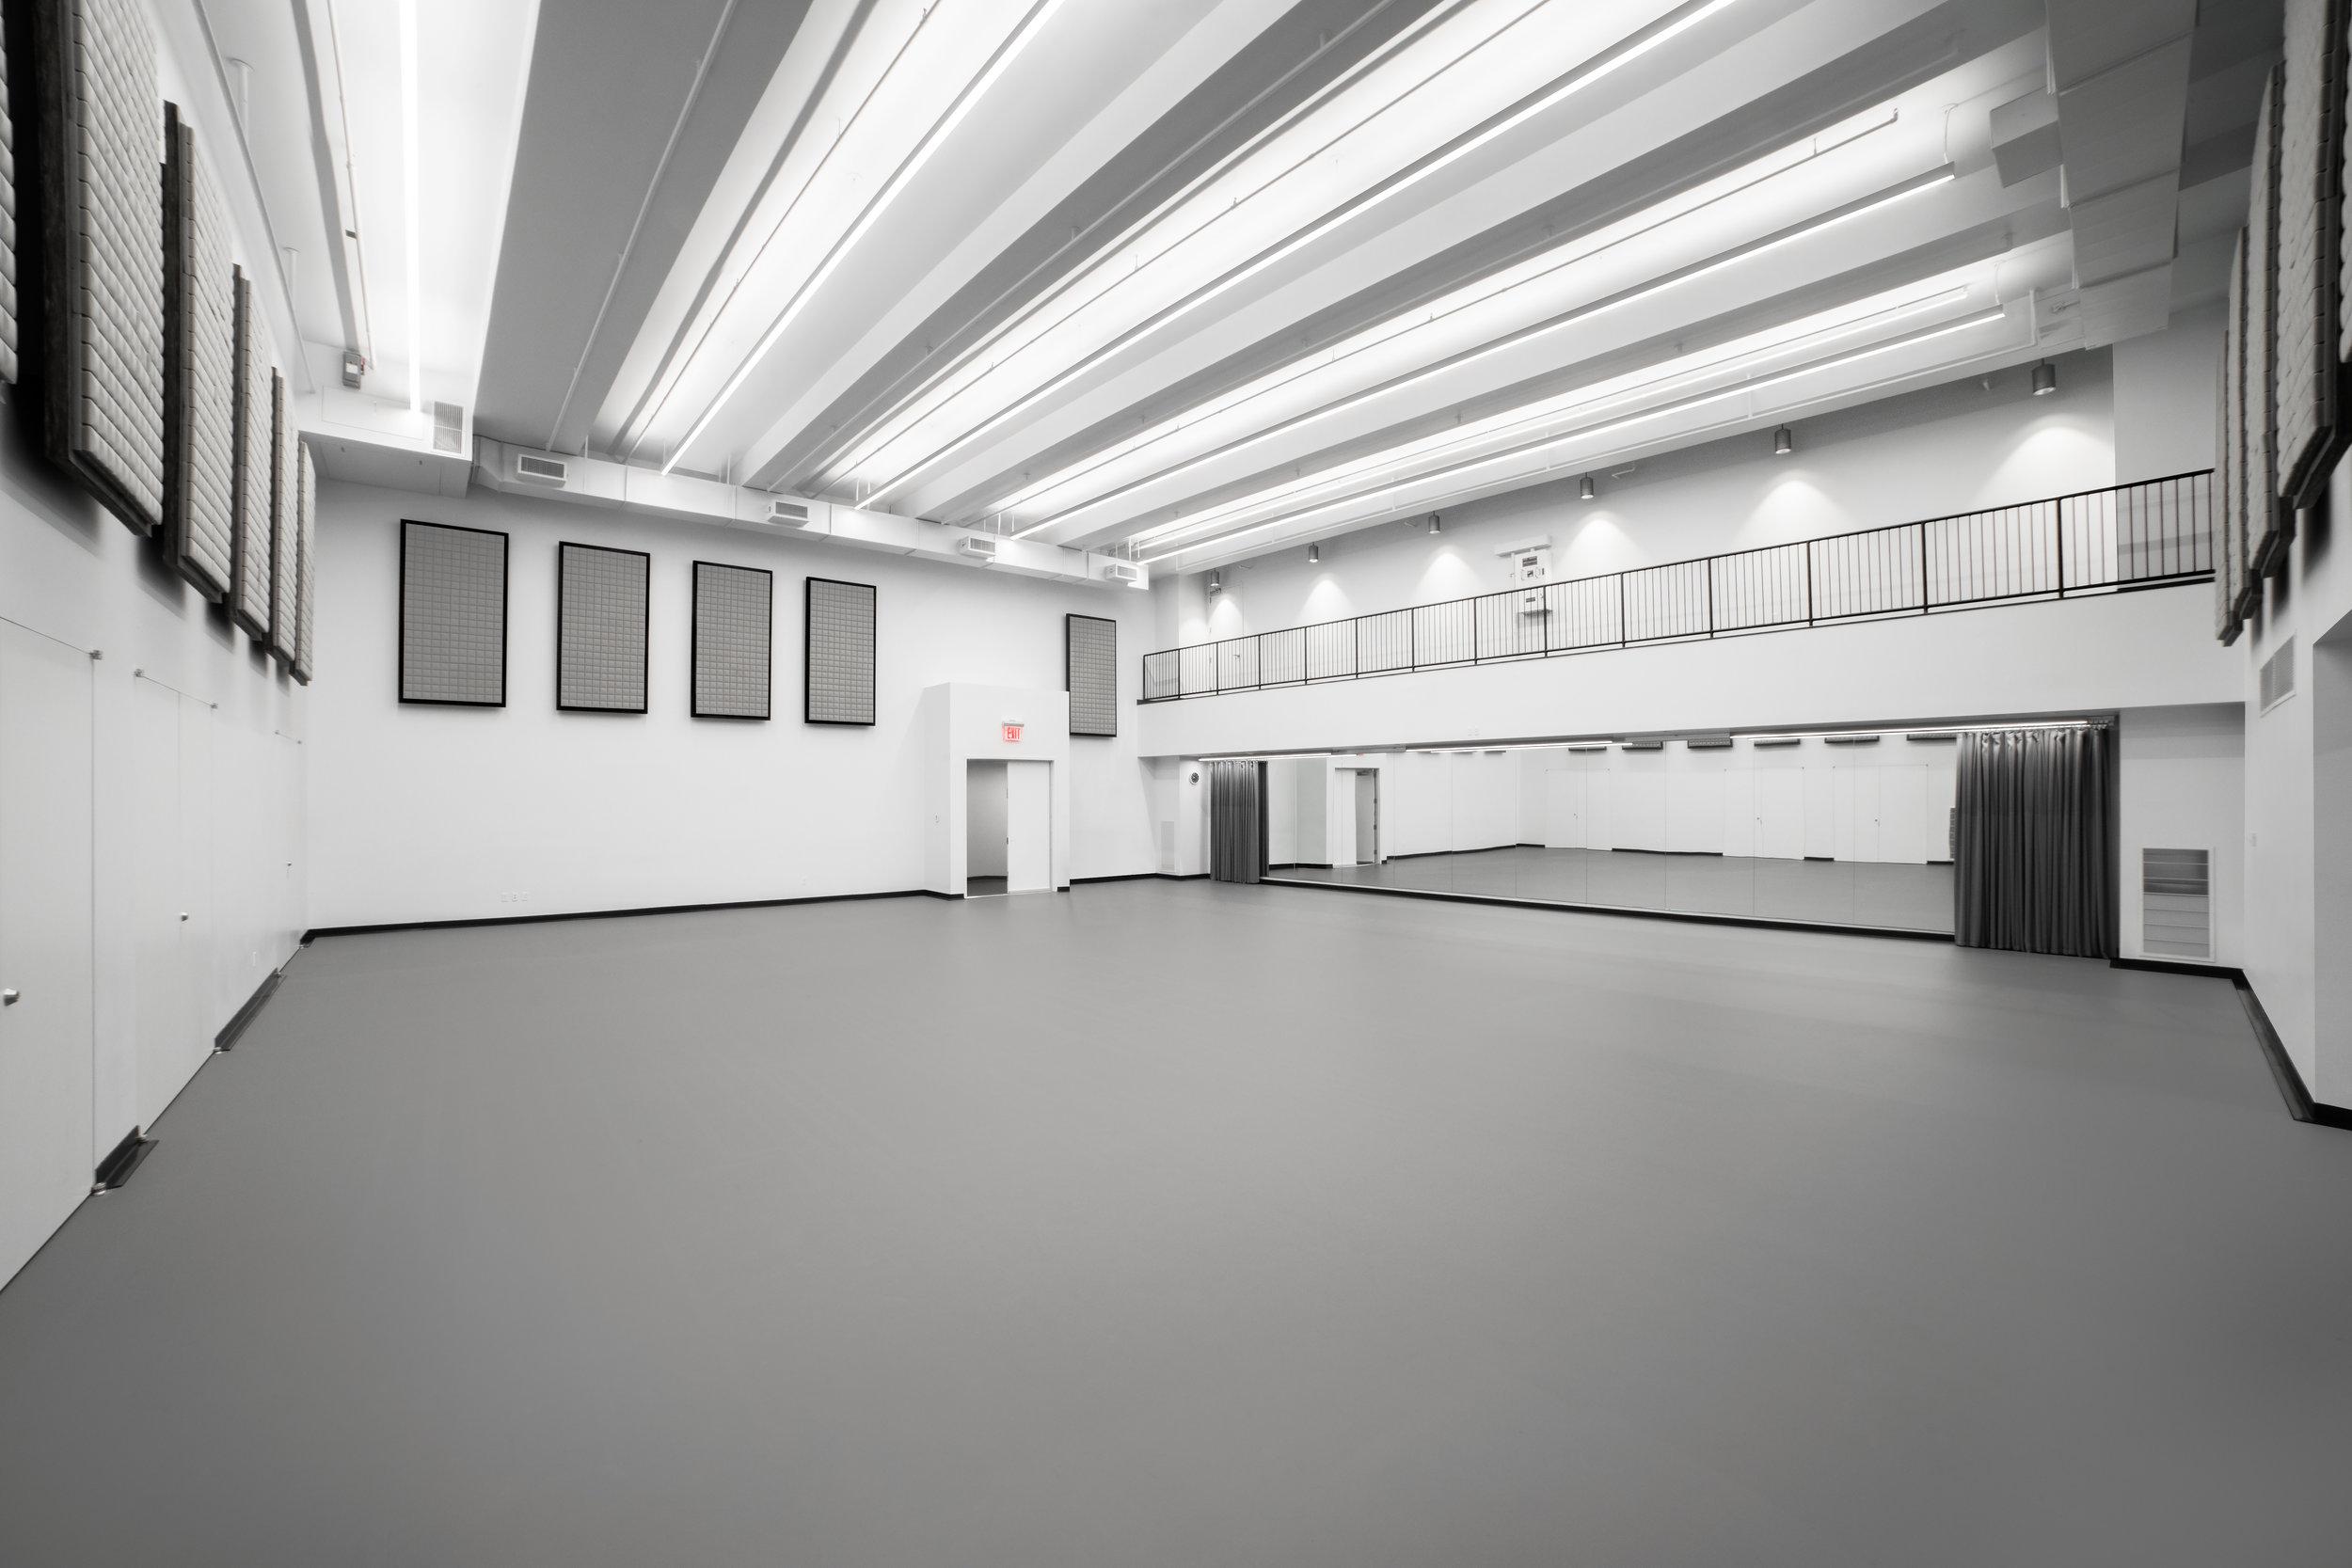 STUDIO 11B (66' x 50')